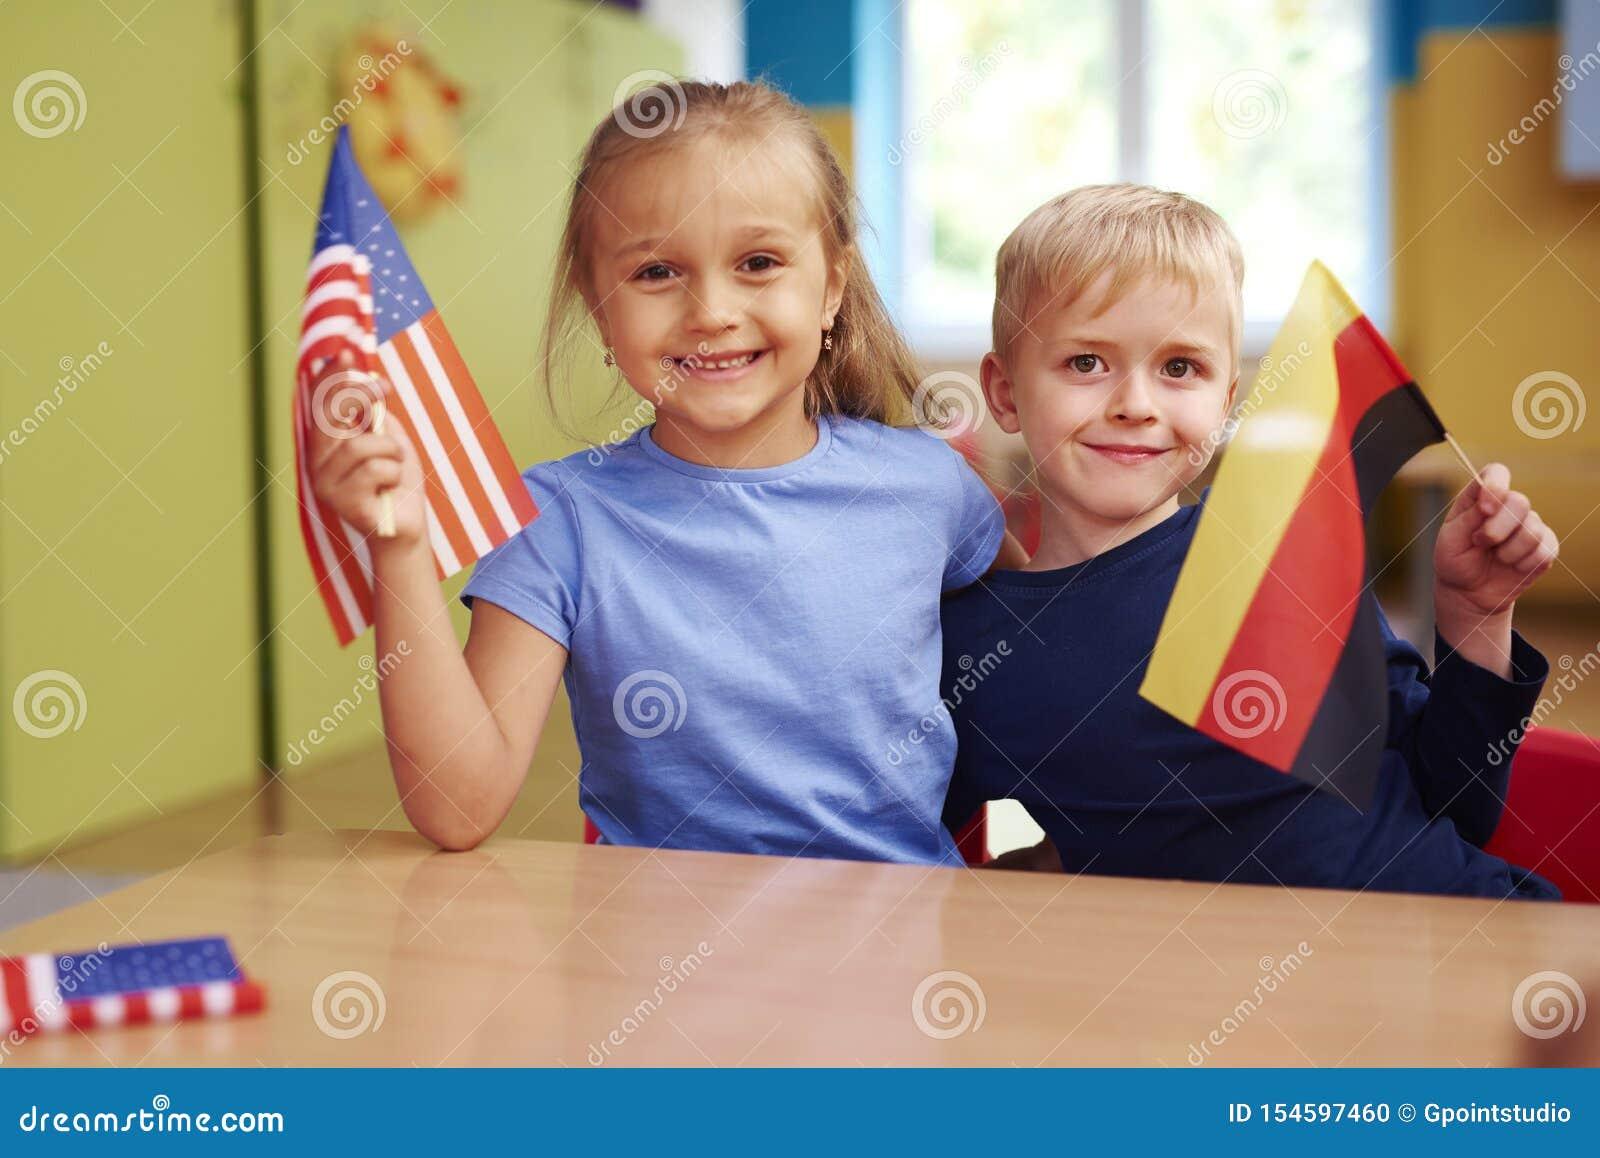 Portrait of preschool children learning languages